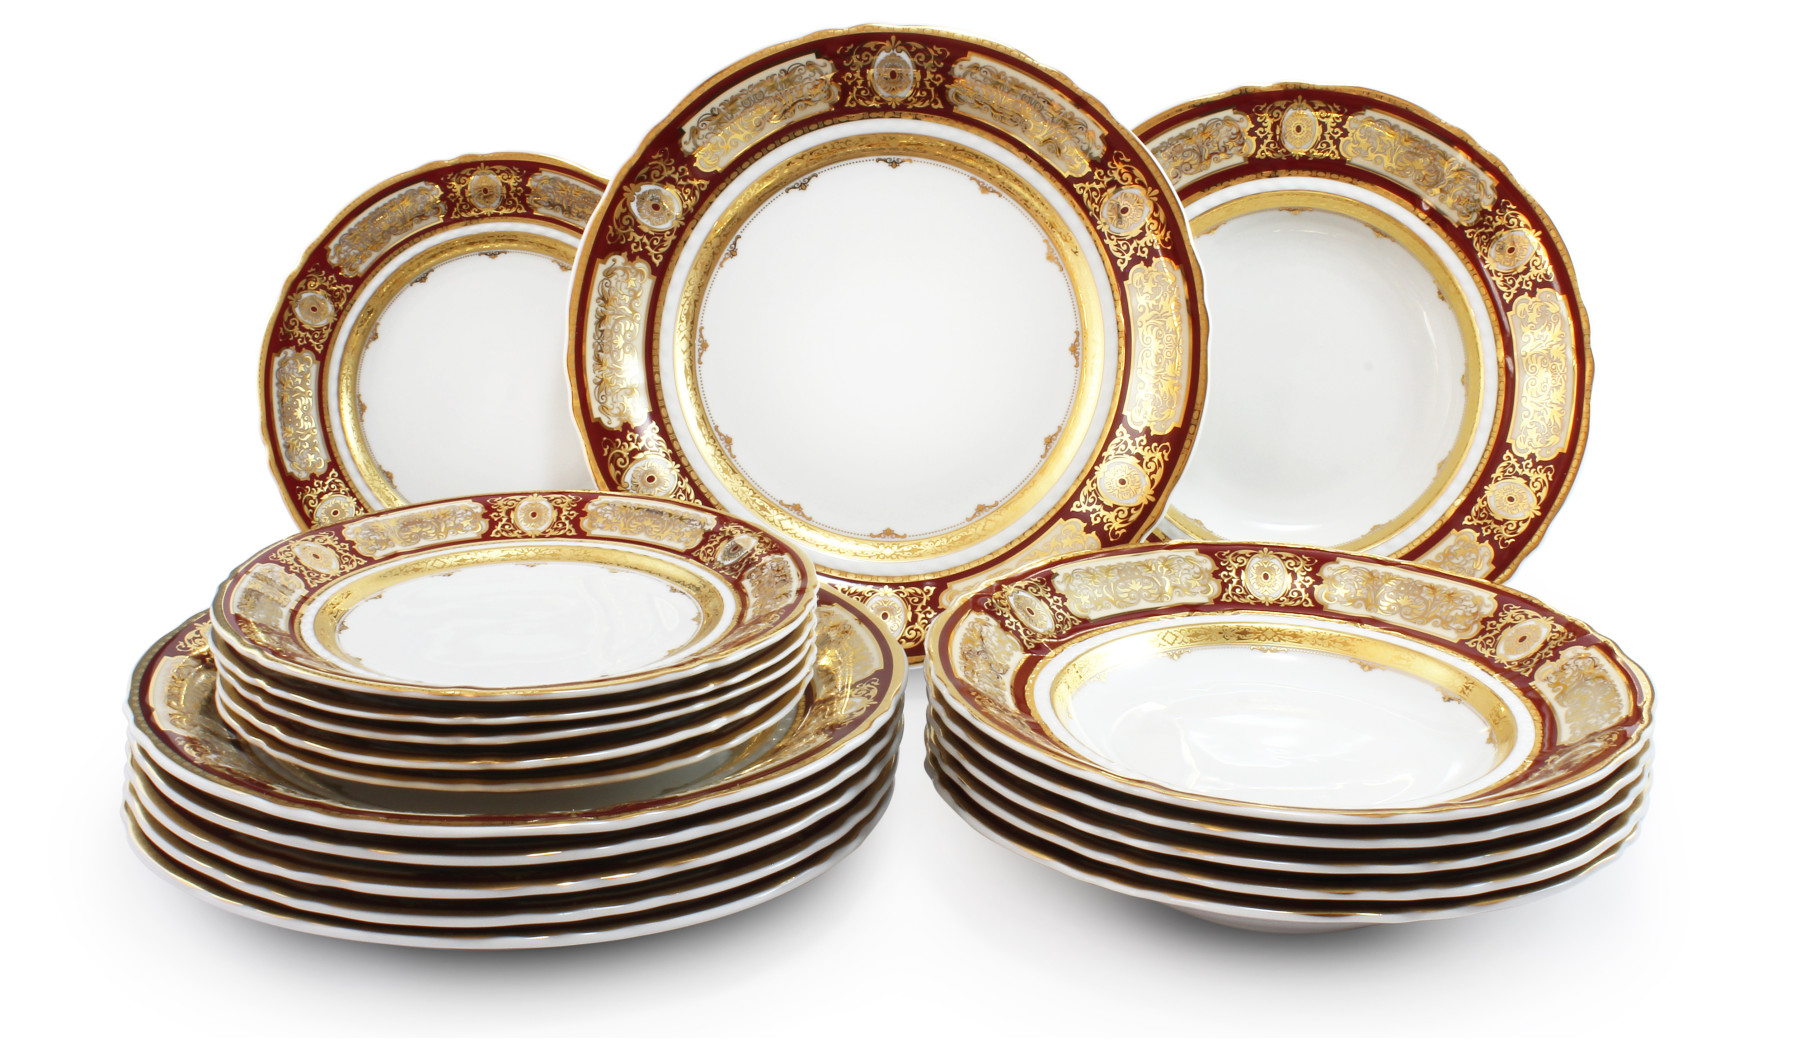 Plate set 18-piece - Magic brooch